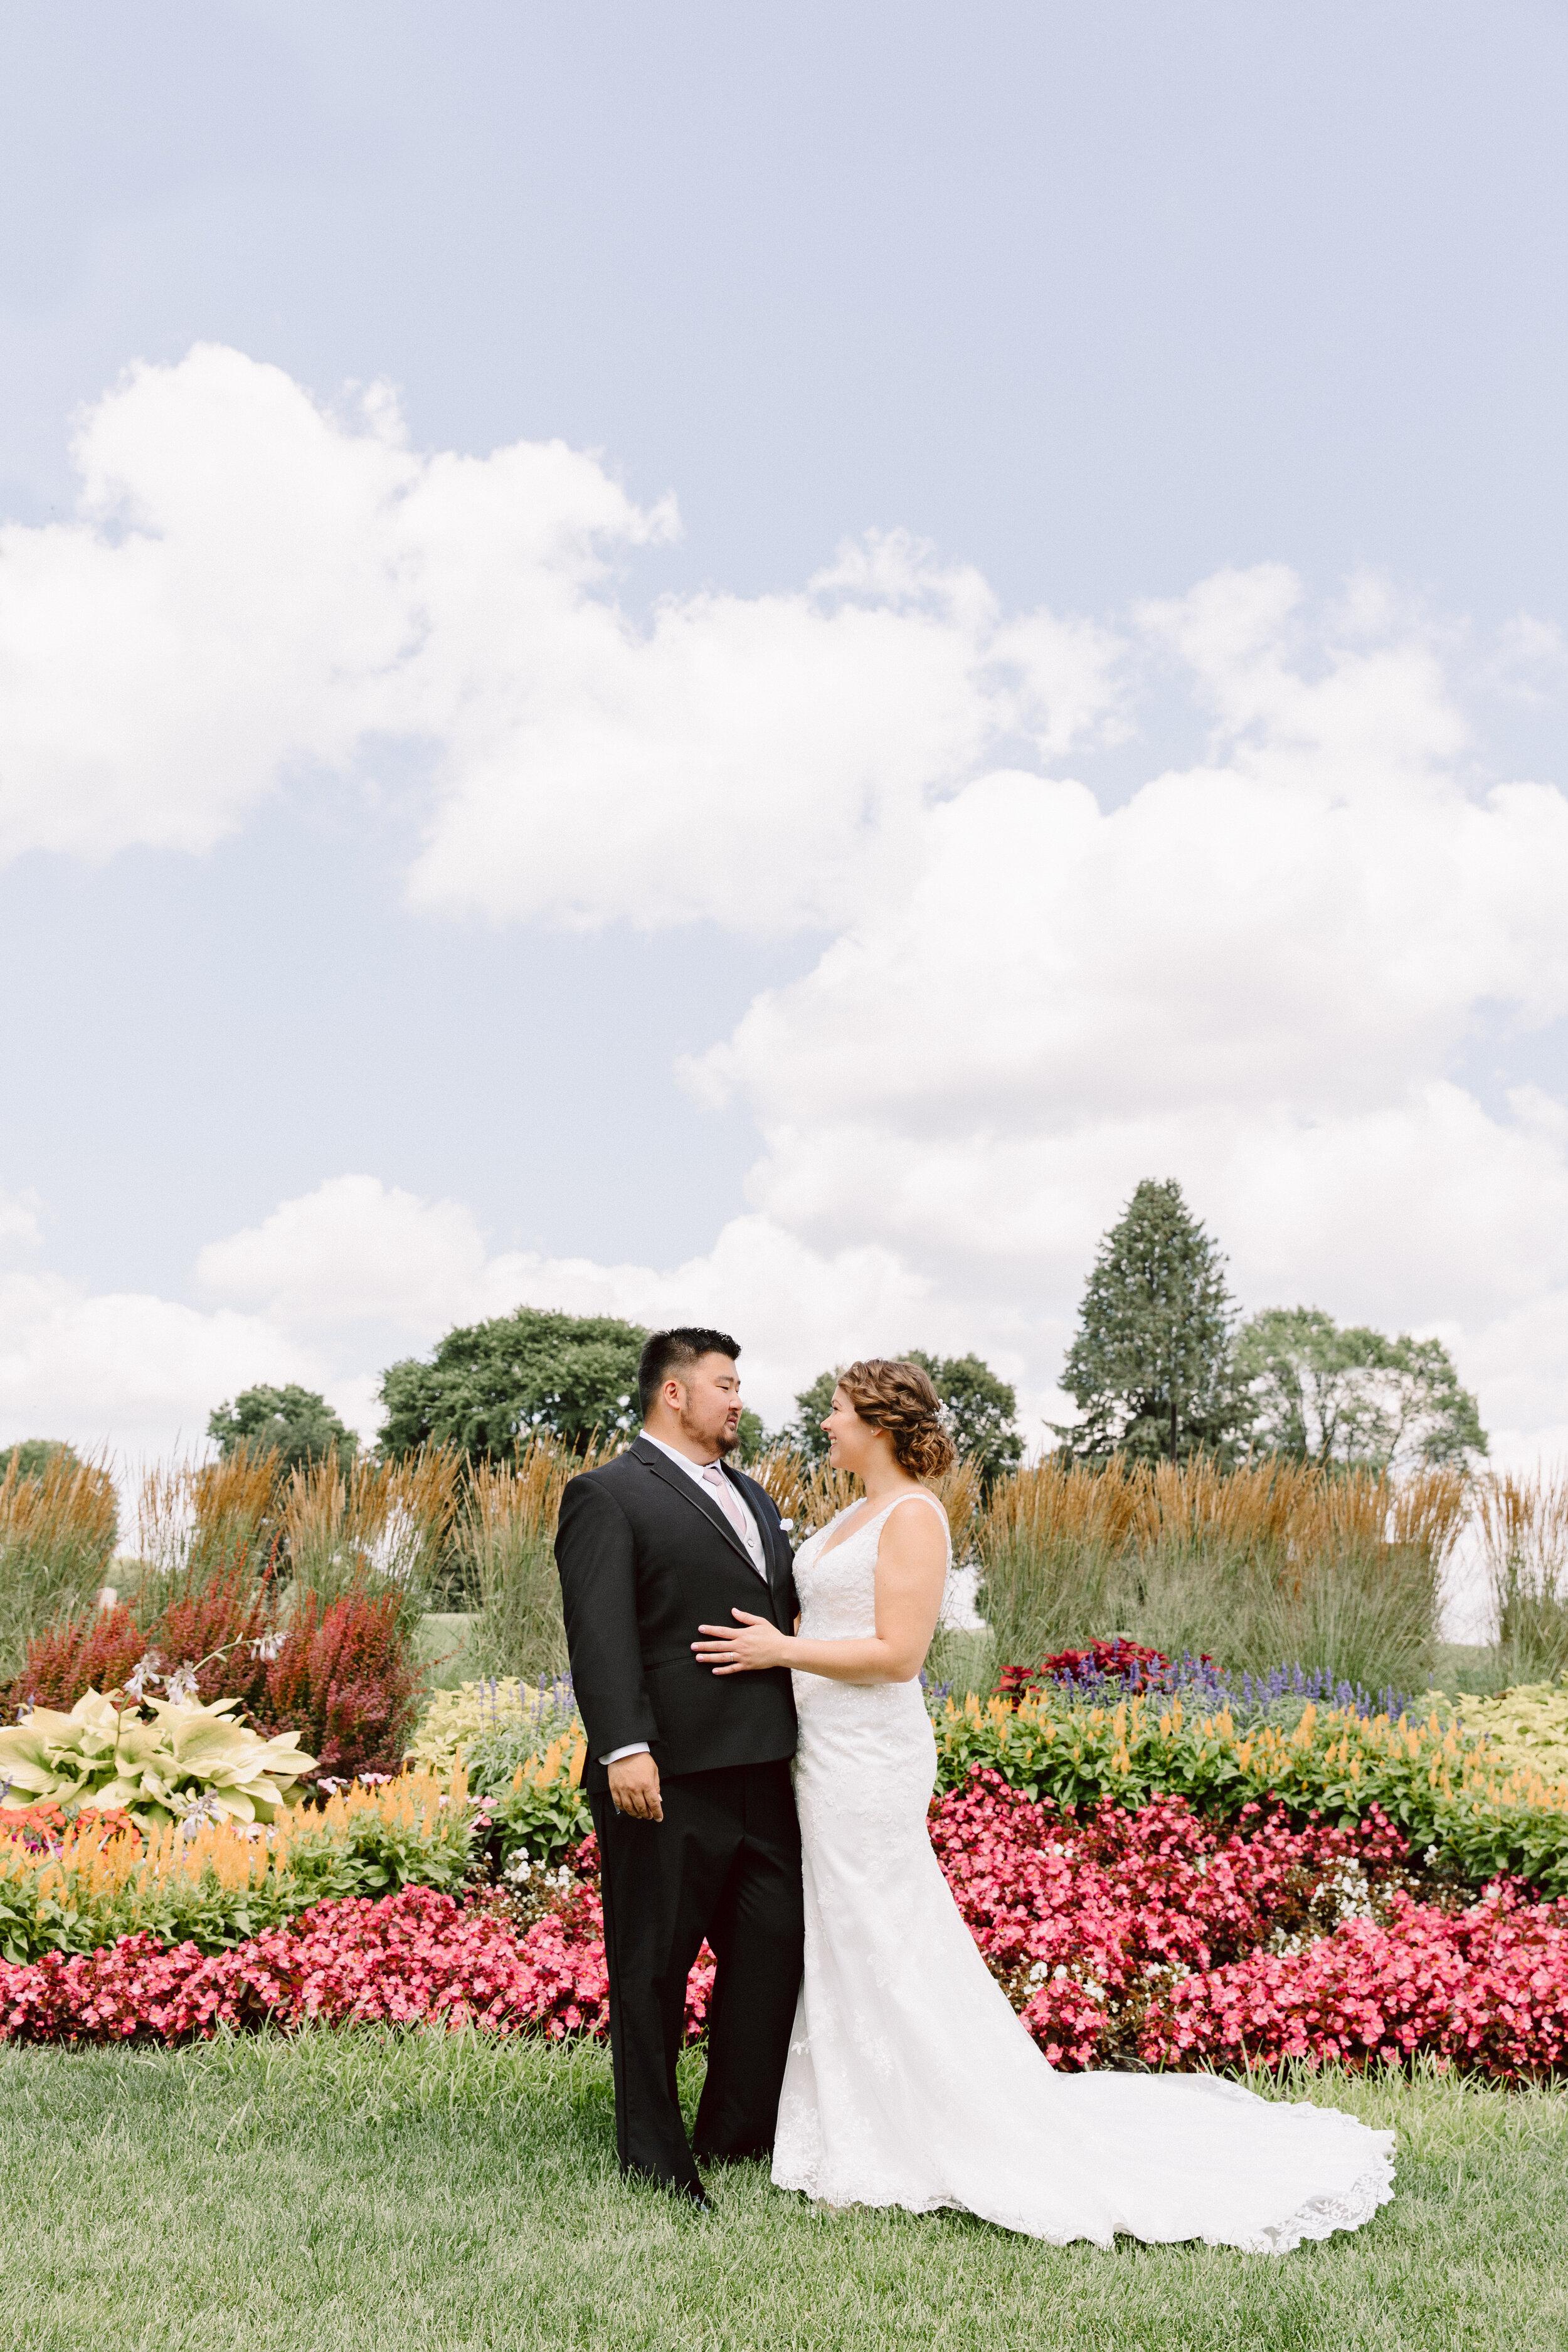 S&B Wedding -Bride & Groom-56.jpg